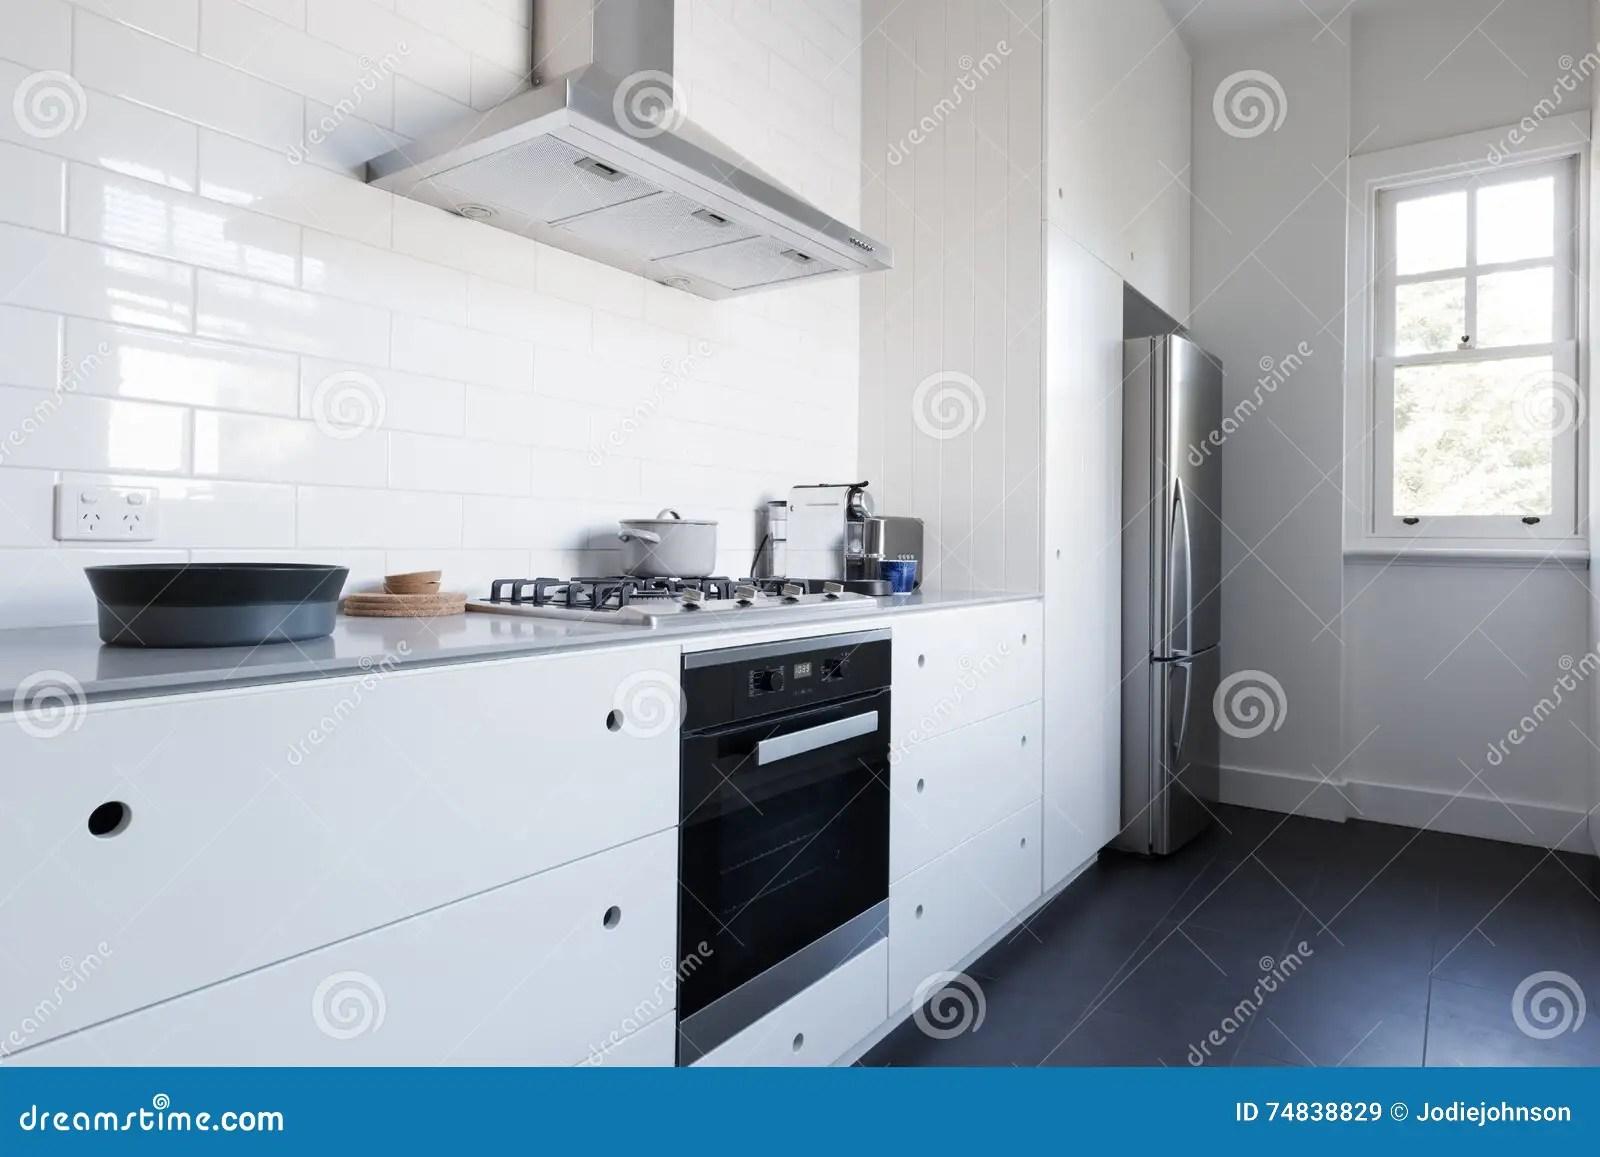 in stock kitchens used kitchen cabinets for sale 与装置的单色干净的白色厨房benchtop 库存图片 图片包括有内部 现代